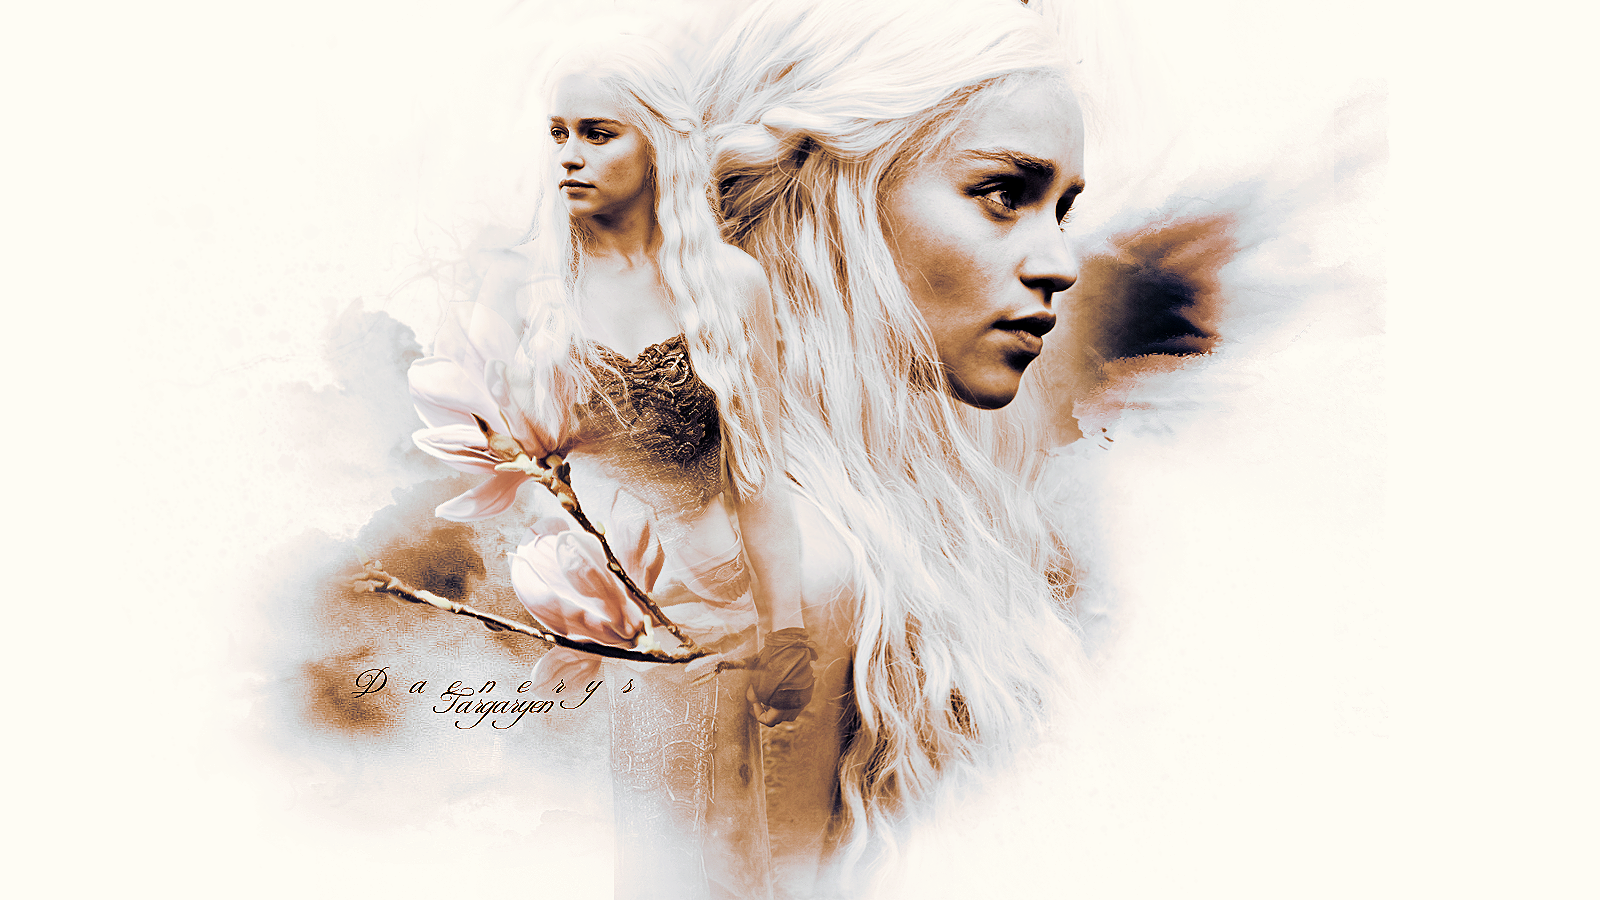 khaleesi wallpaper game - photo #25